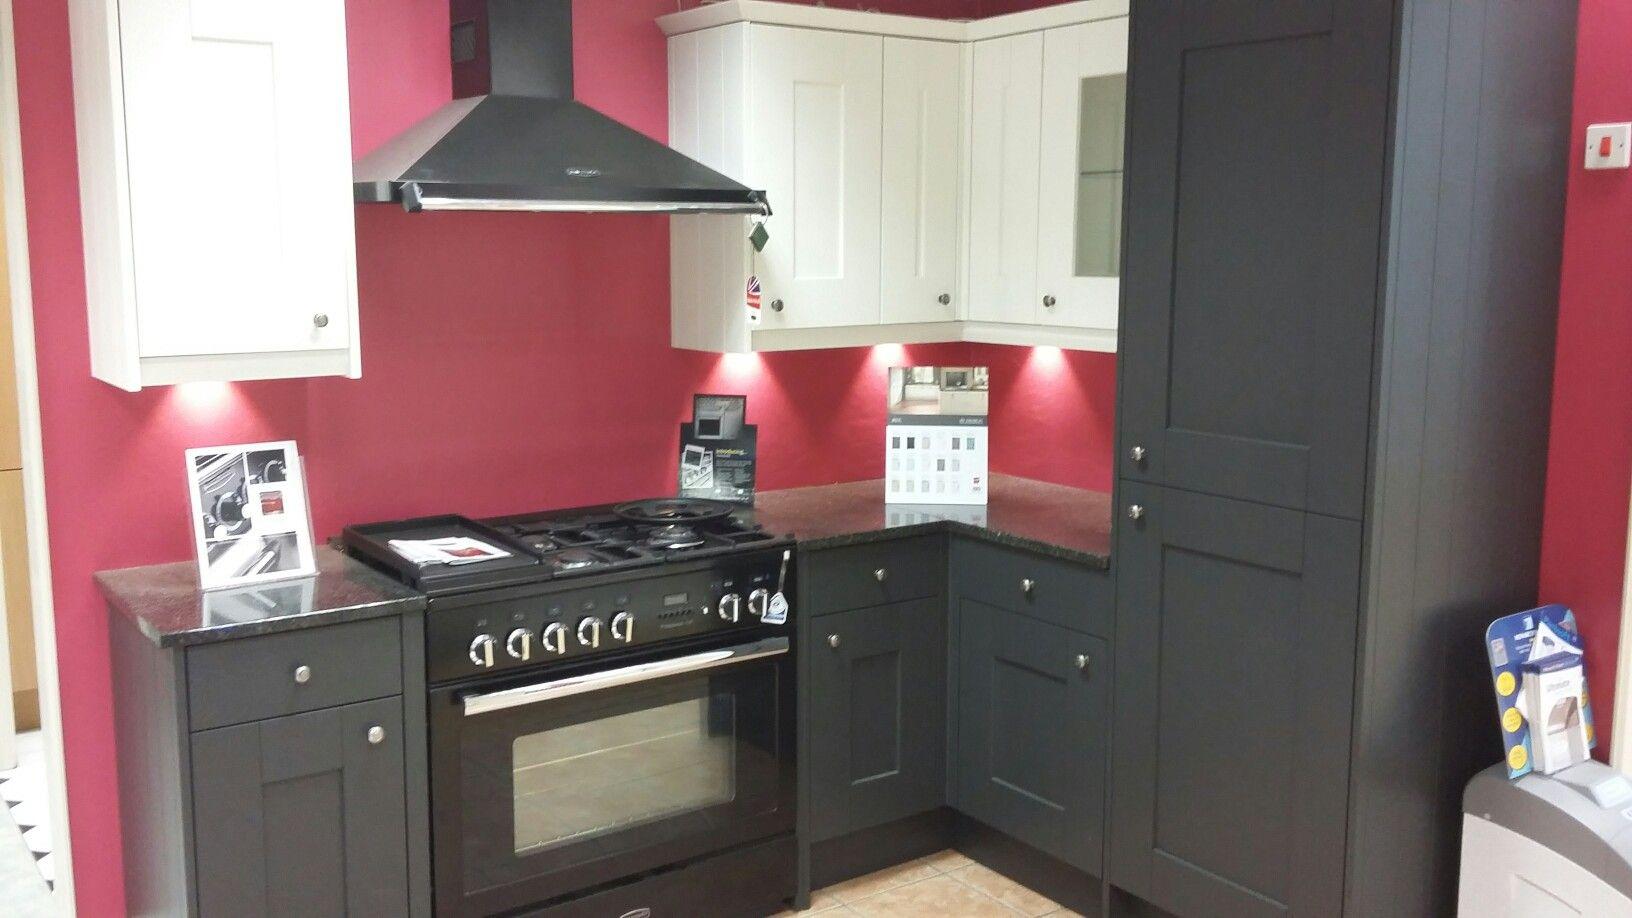 BY DESIGN Rye Painted kitchen with Rangemaster Appliances